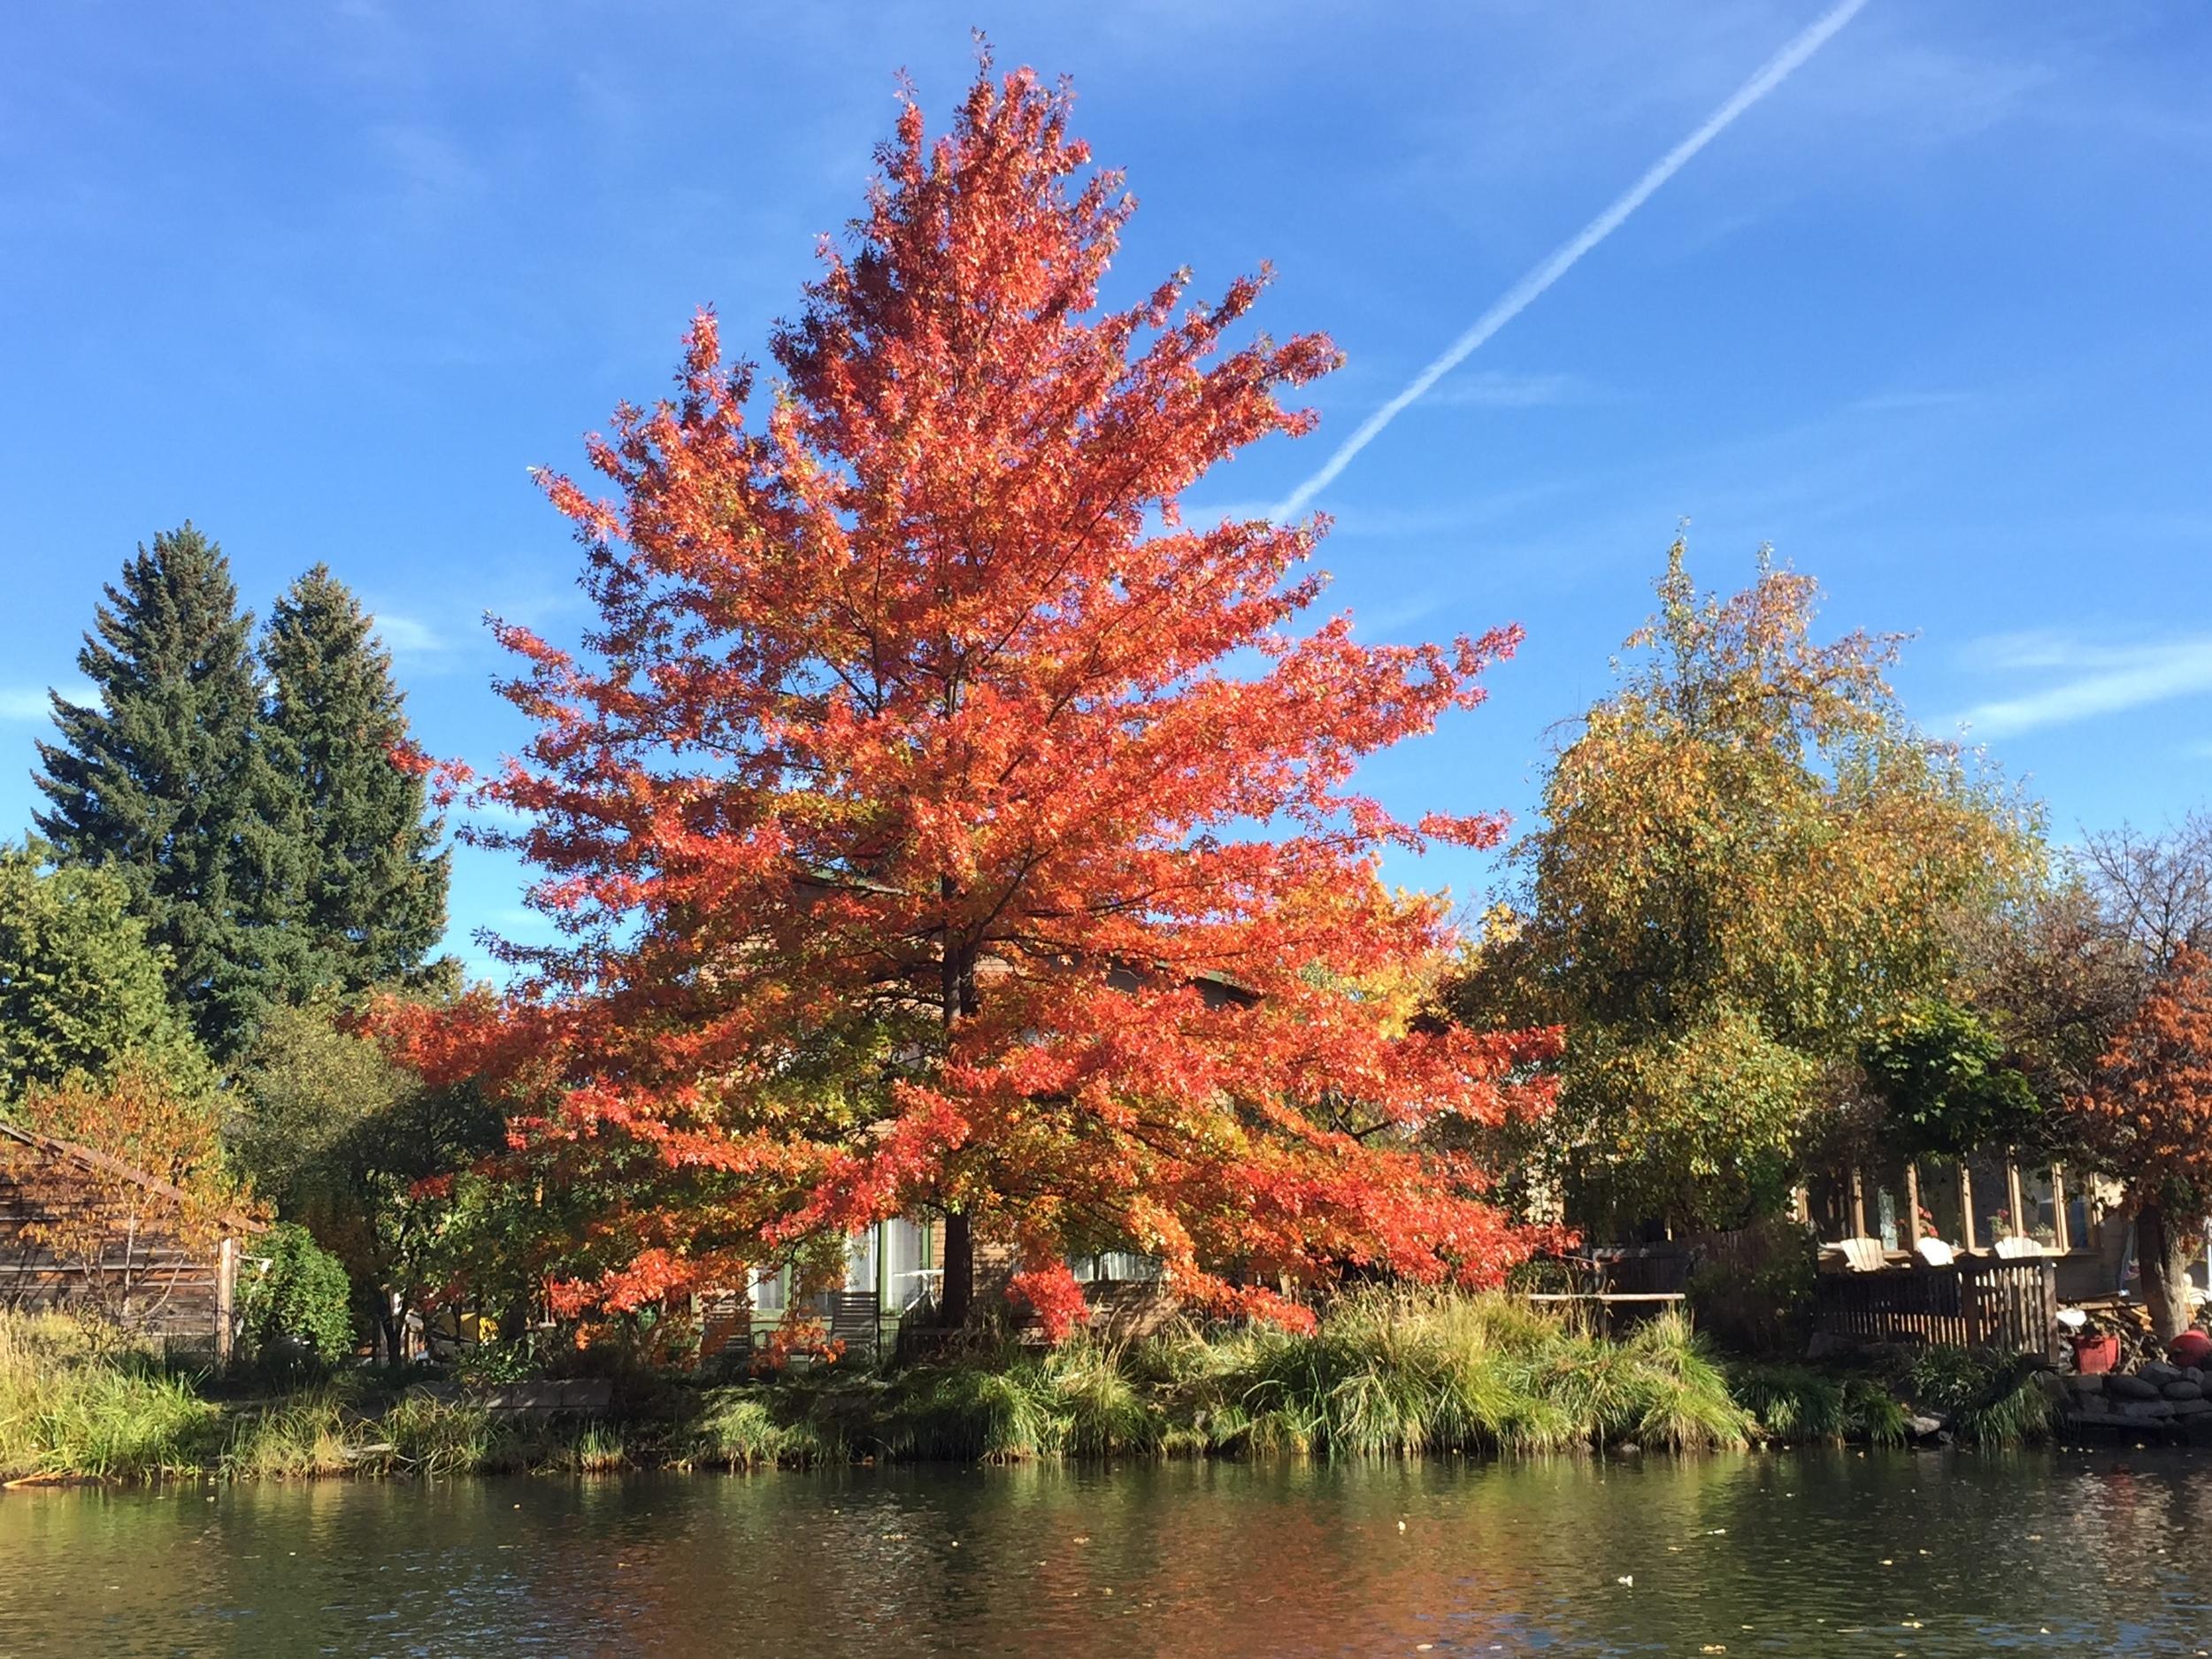 Pin Oak (Quercus palustris) on Deschutes River in Bend, OR.